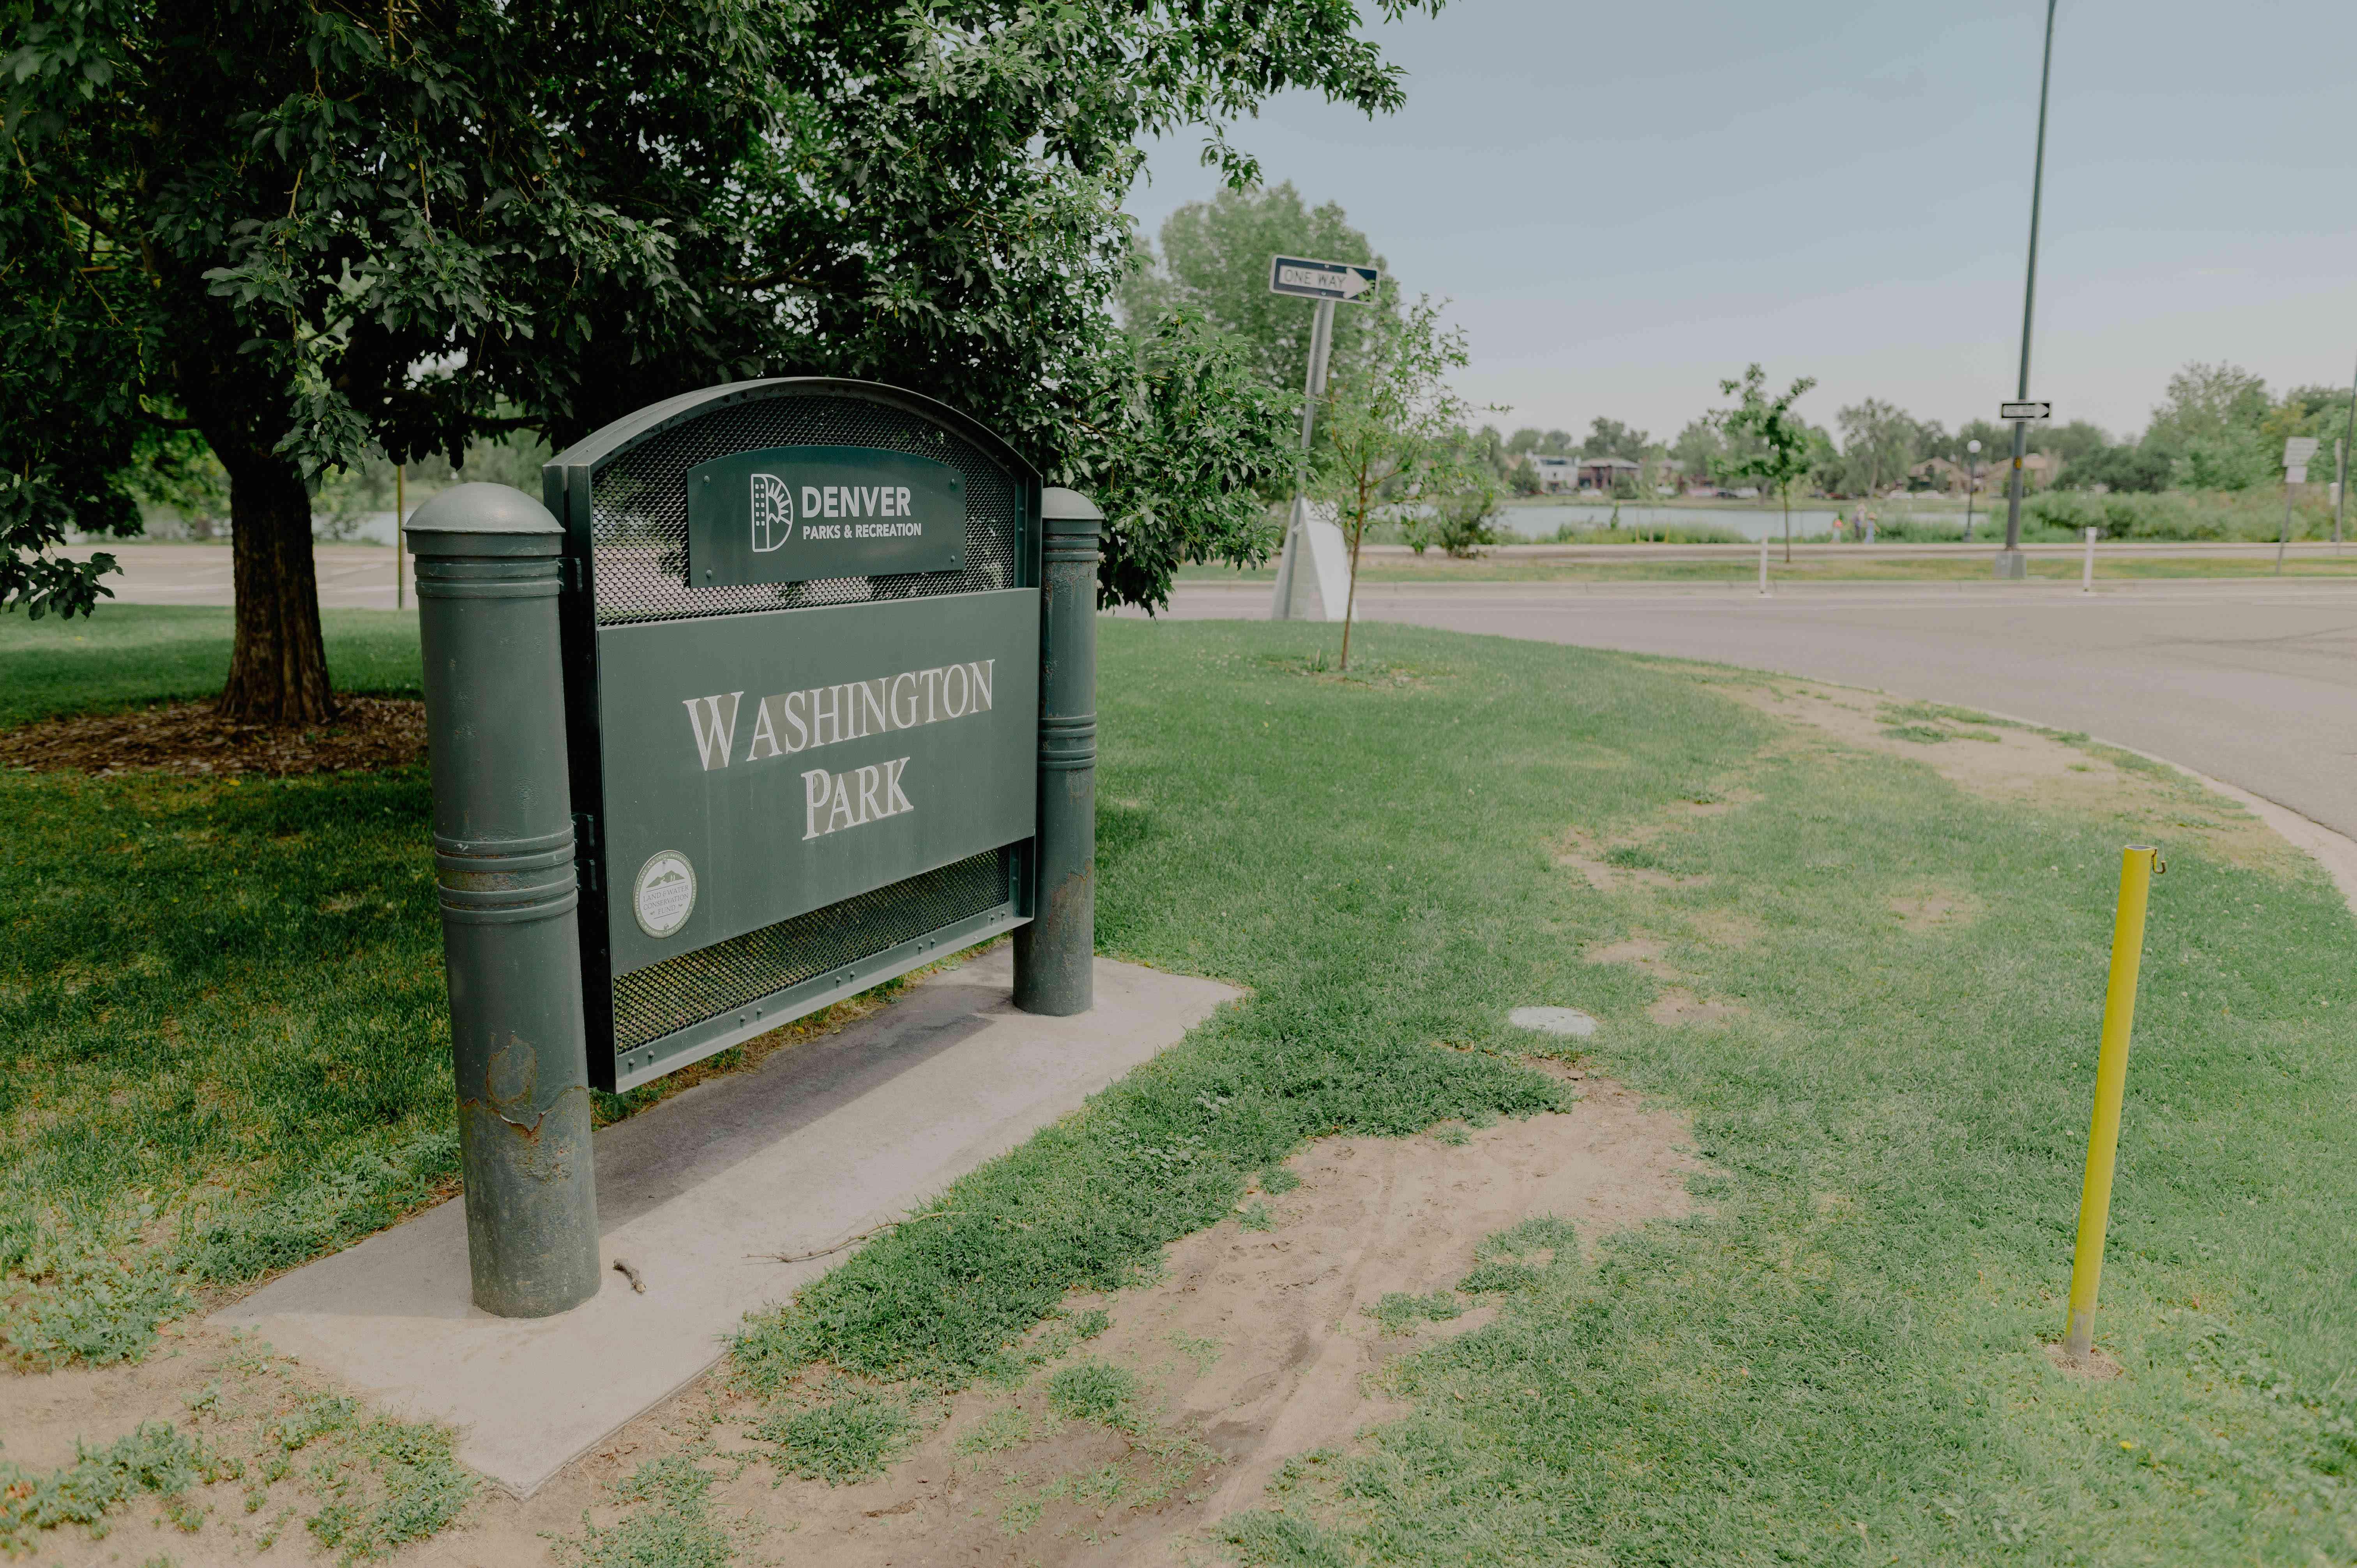 Washington Park, Denver, Colorado